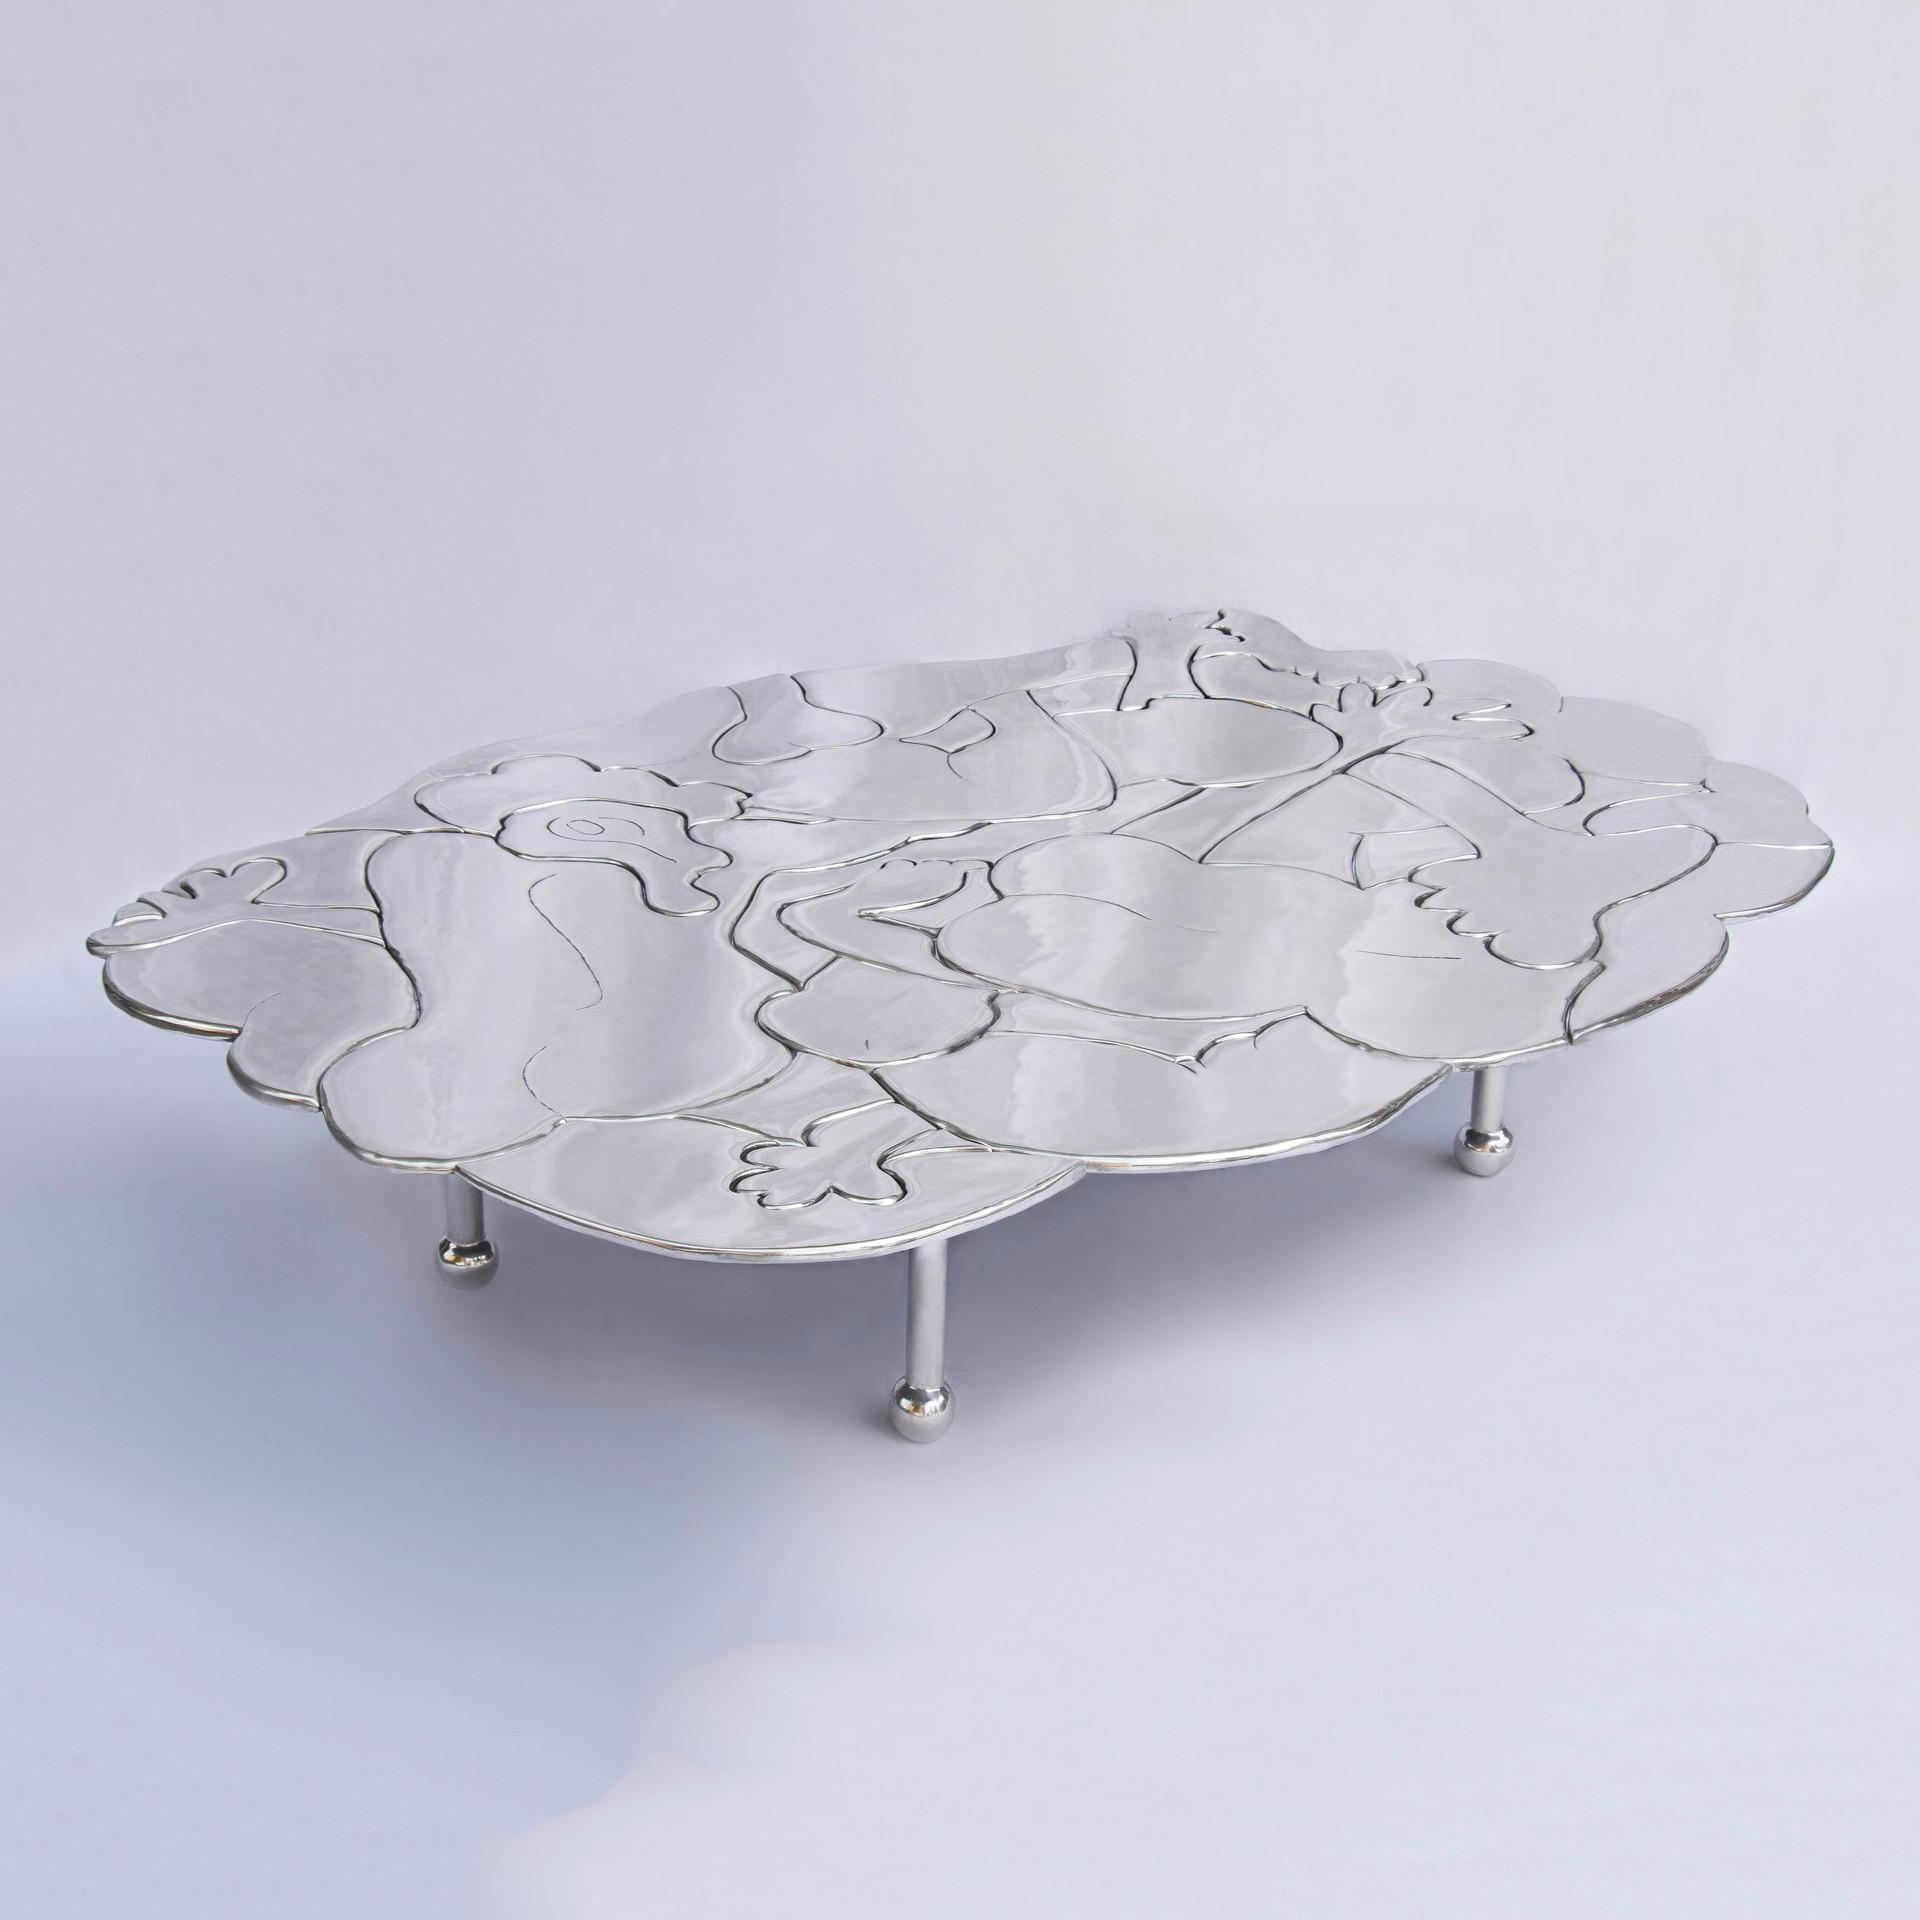 Chicharrón_Table.jpg